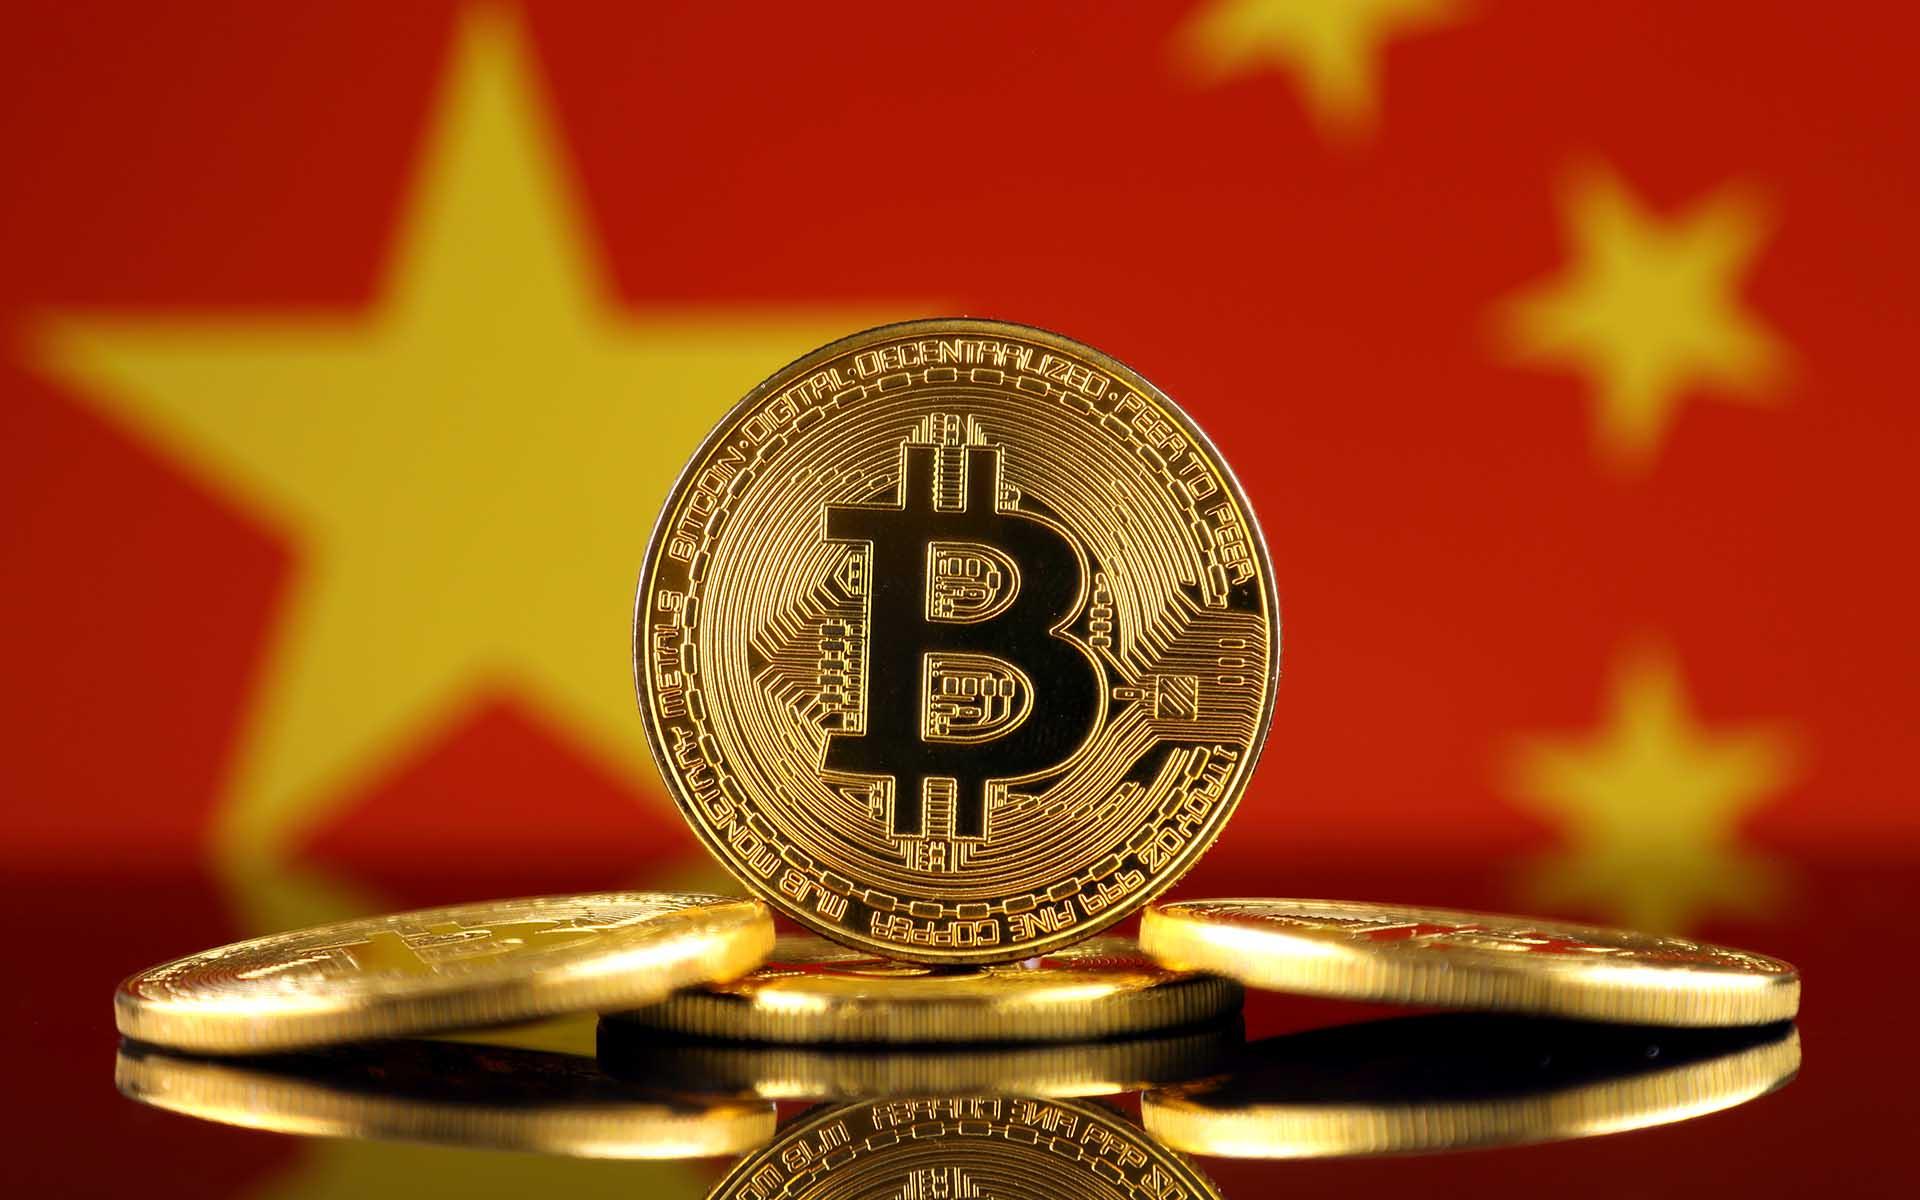 Курс биткоина падает. Китай нанес новый удар